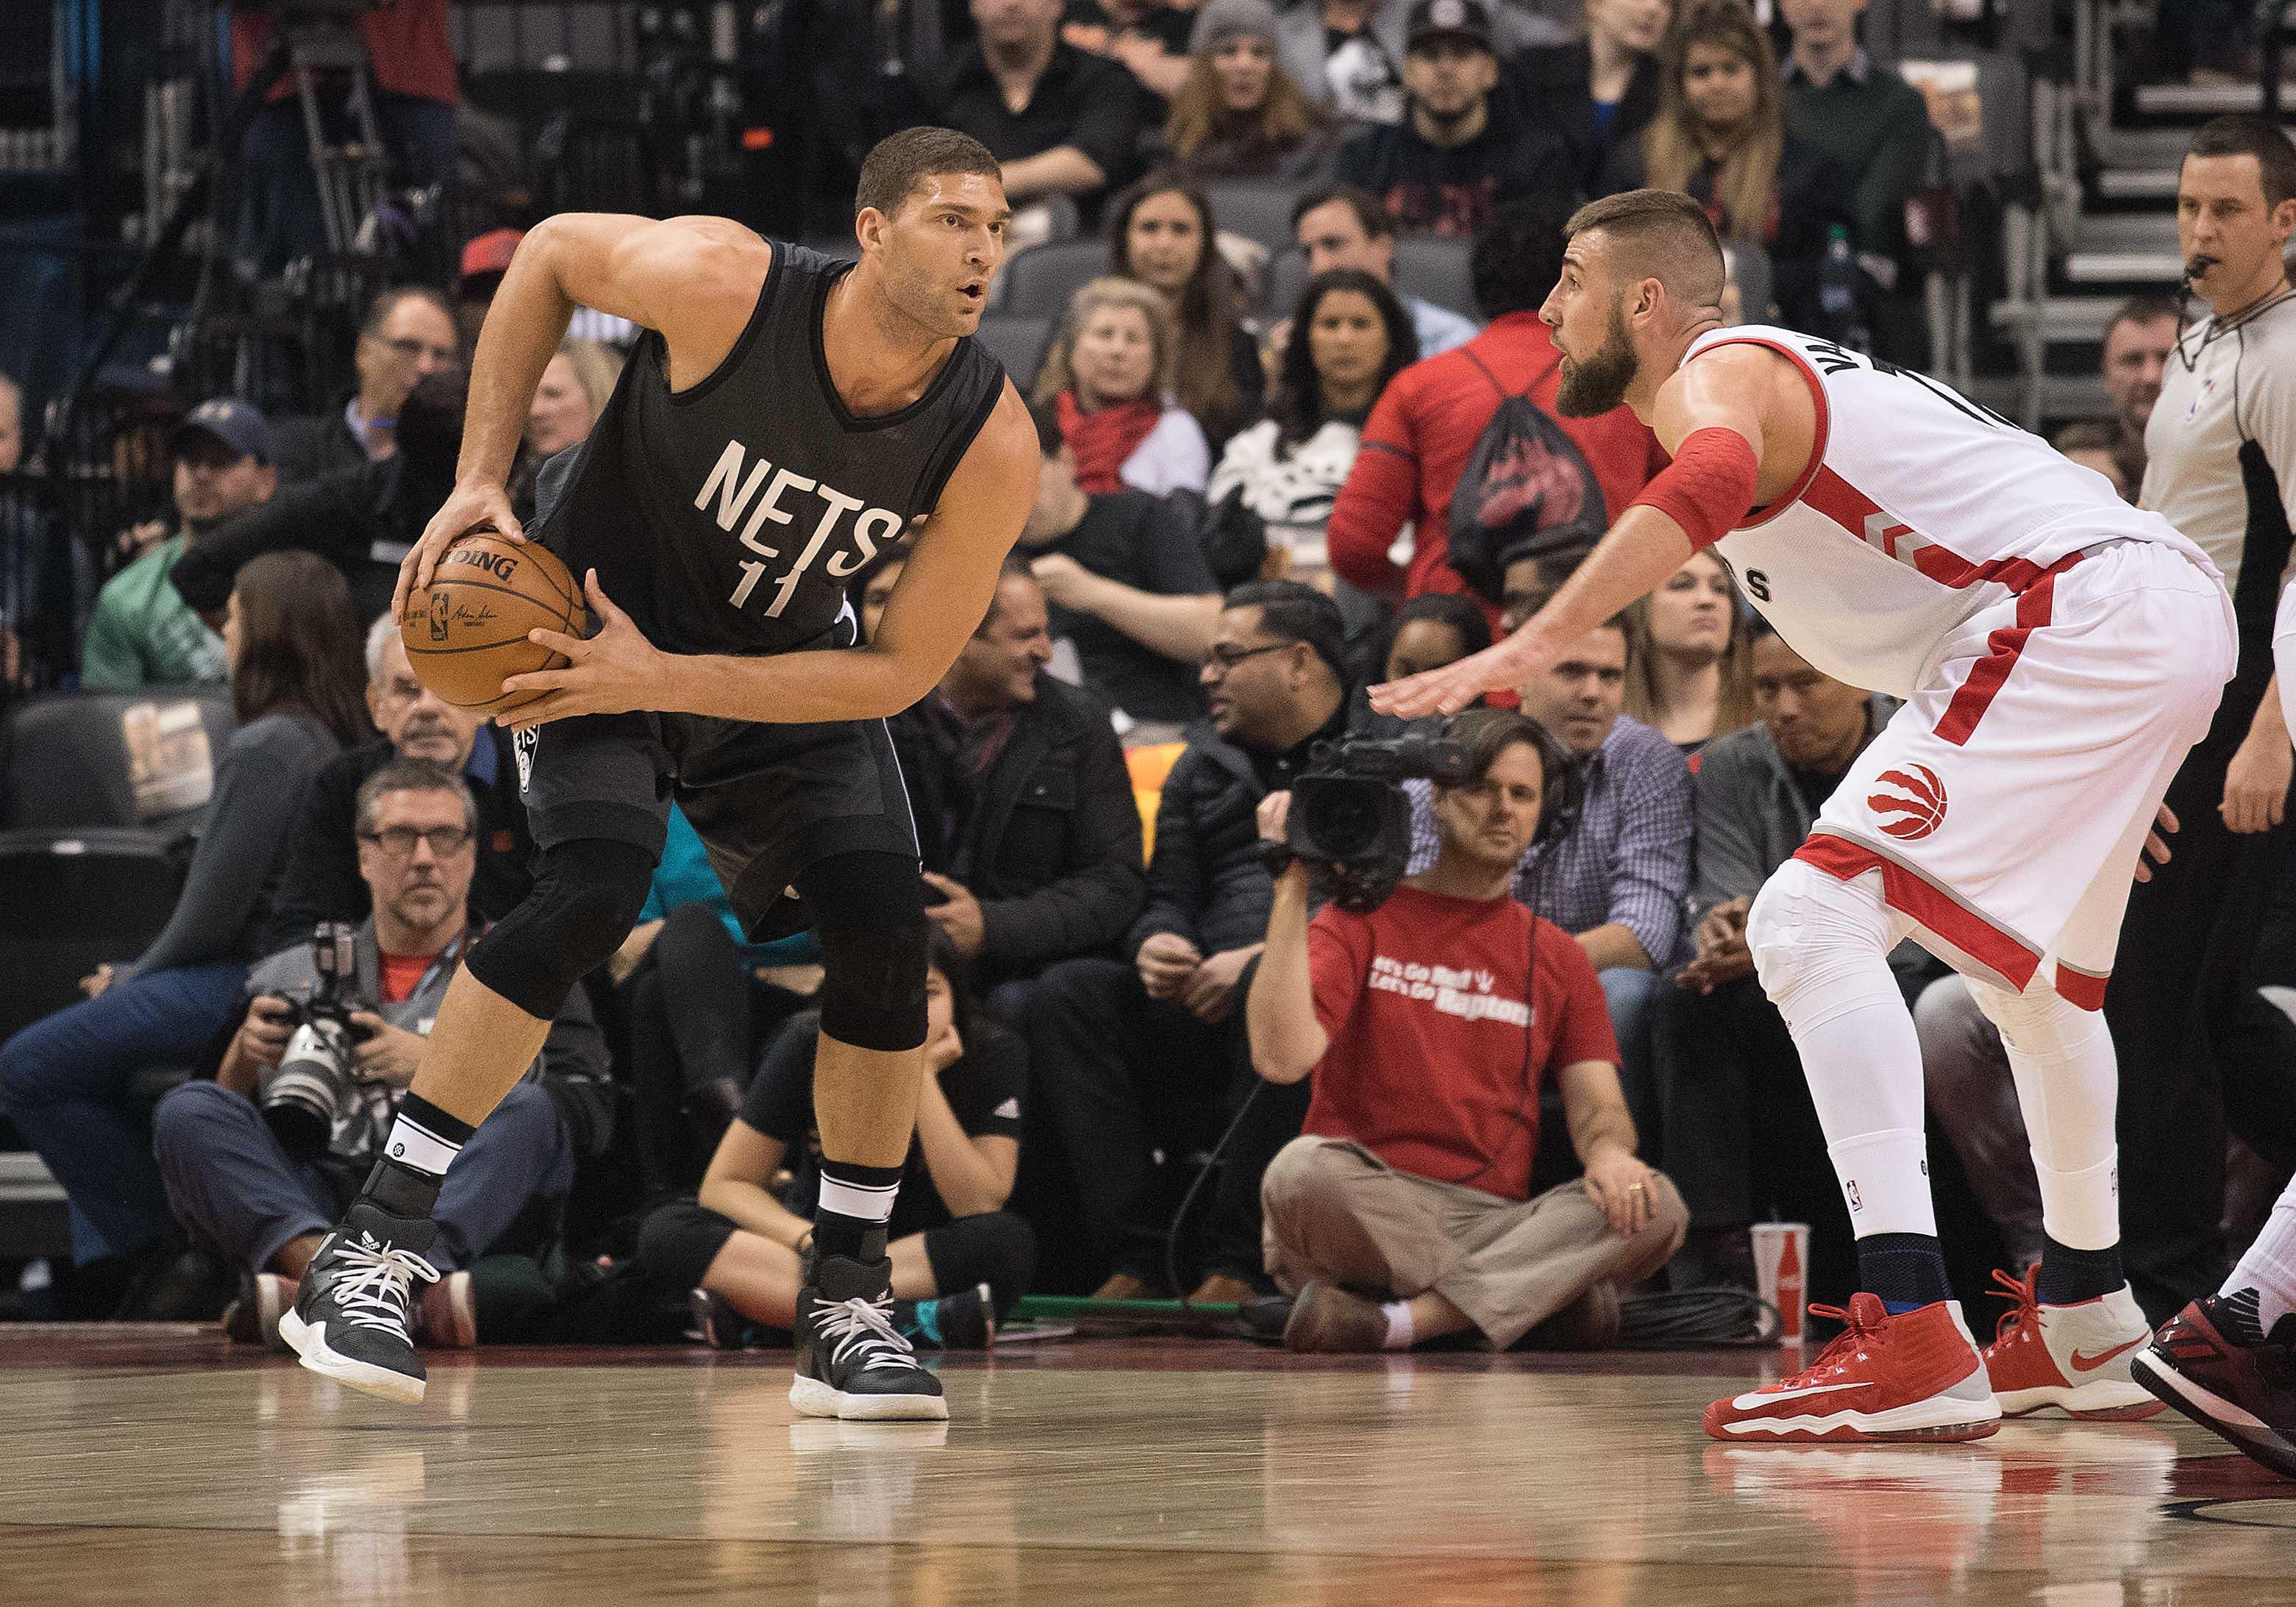 Nets Vs Raptors: Brooklyn Nets Vs. Toronto Raptors Pre-Game Report 2/5/17